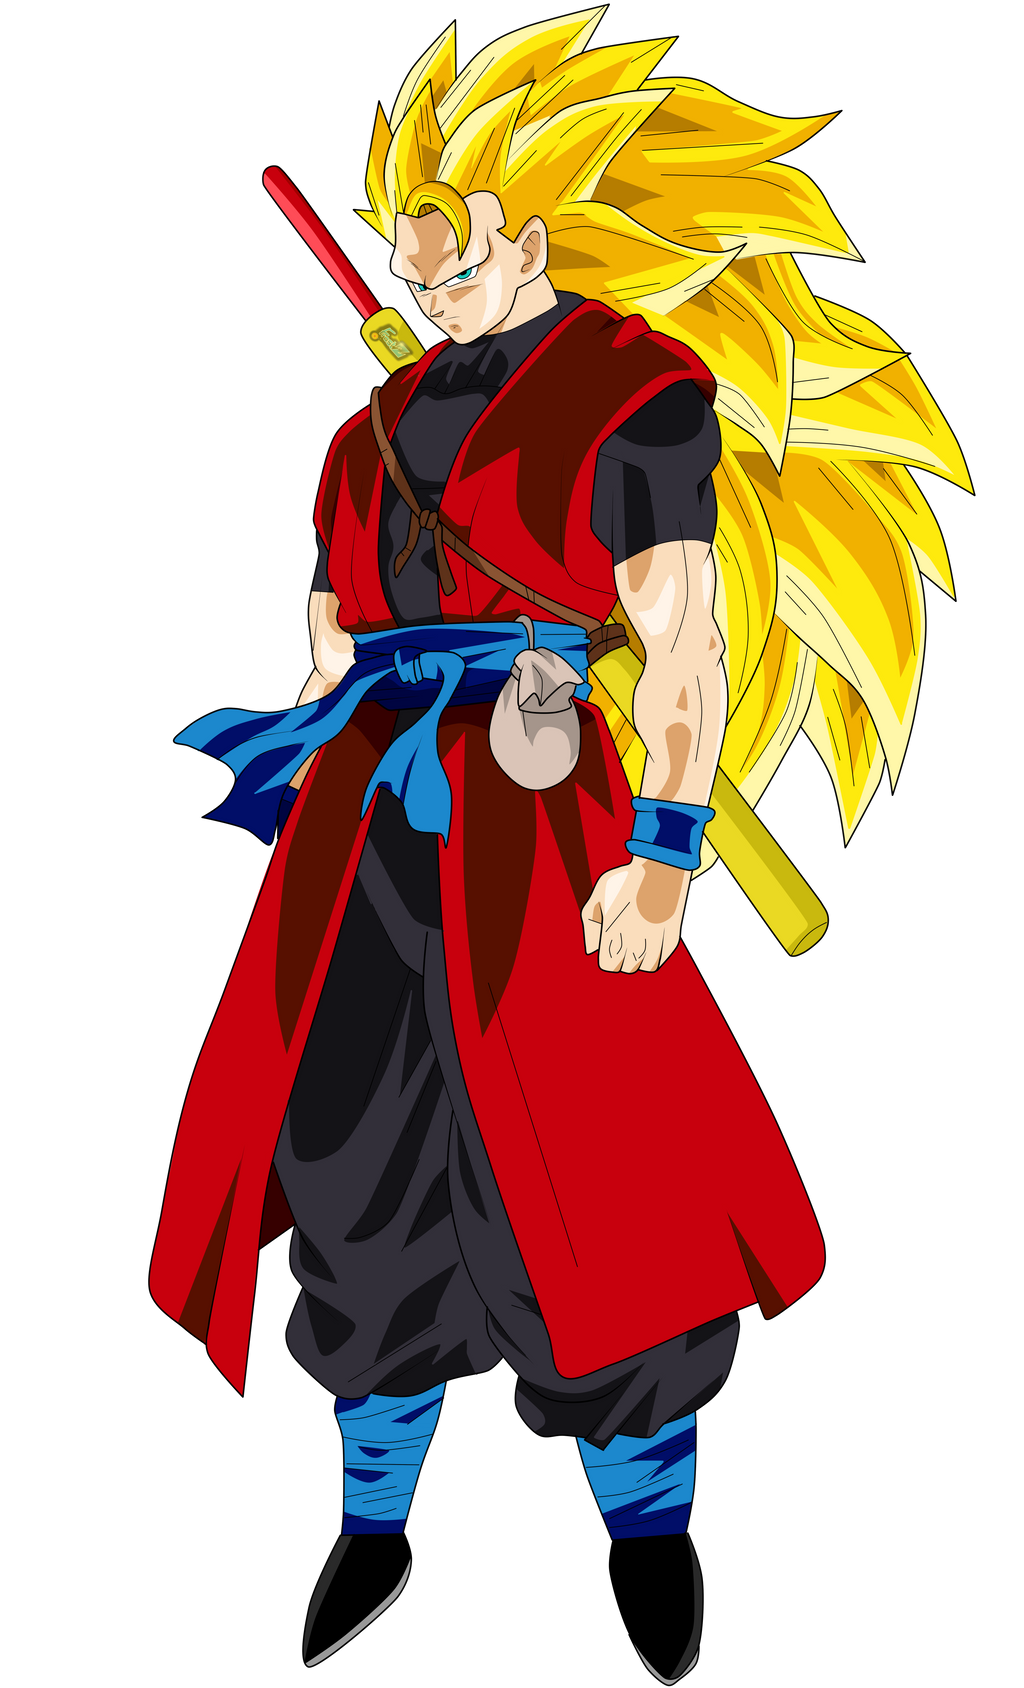 goku xeno super saiyan 3 by chronofz on deviantart